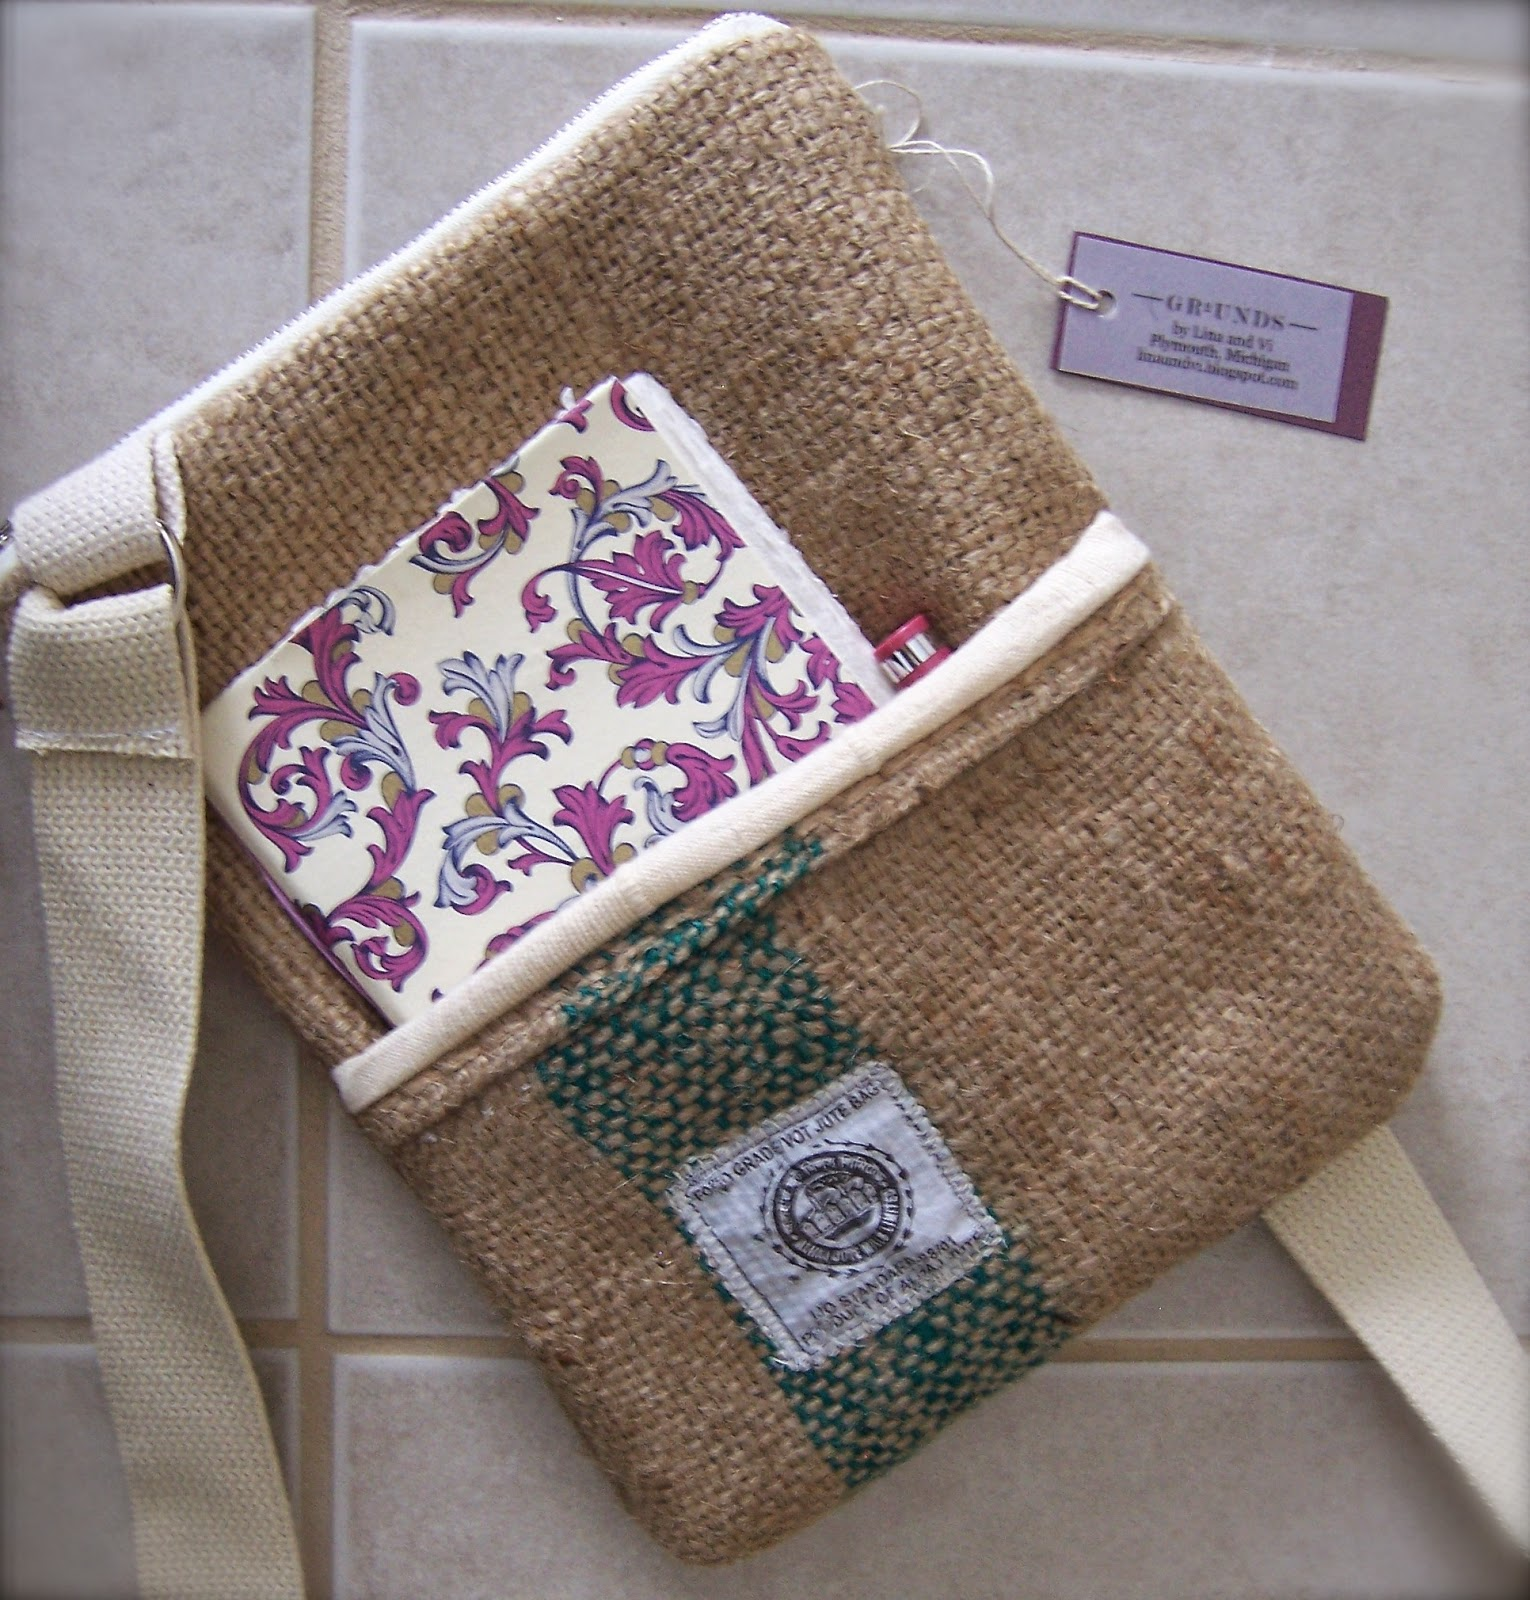 Jute Mills burlap bag top - linaandvi.blogspot.com - Plymouth MI